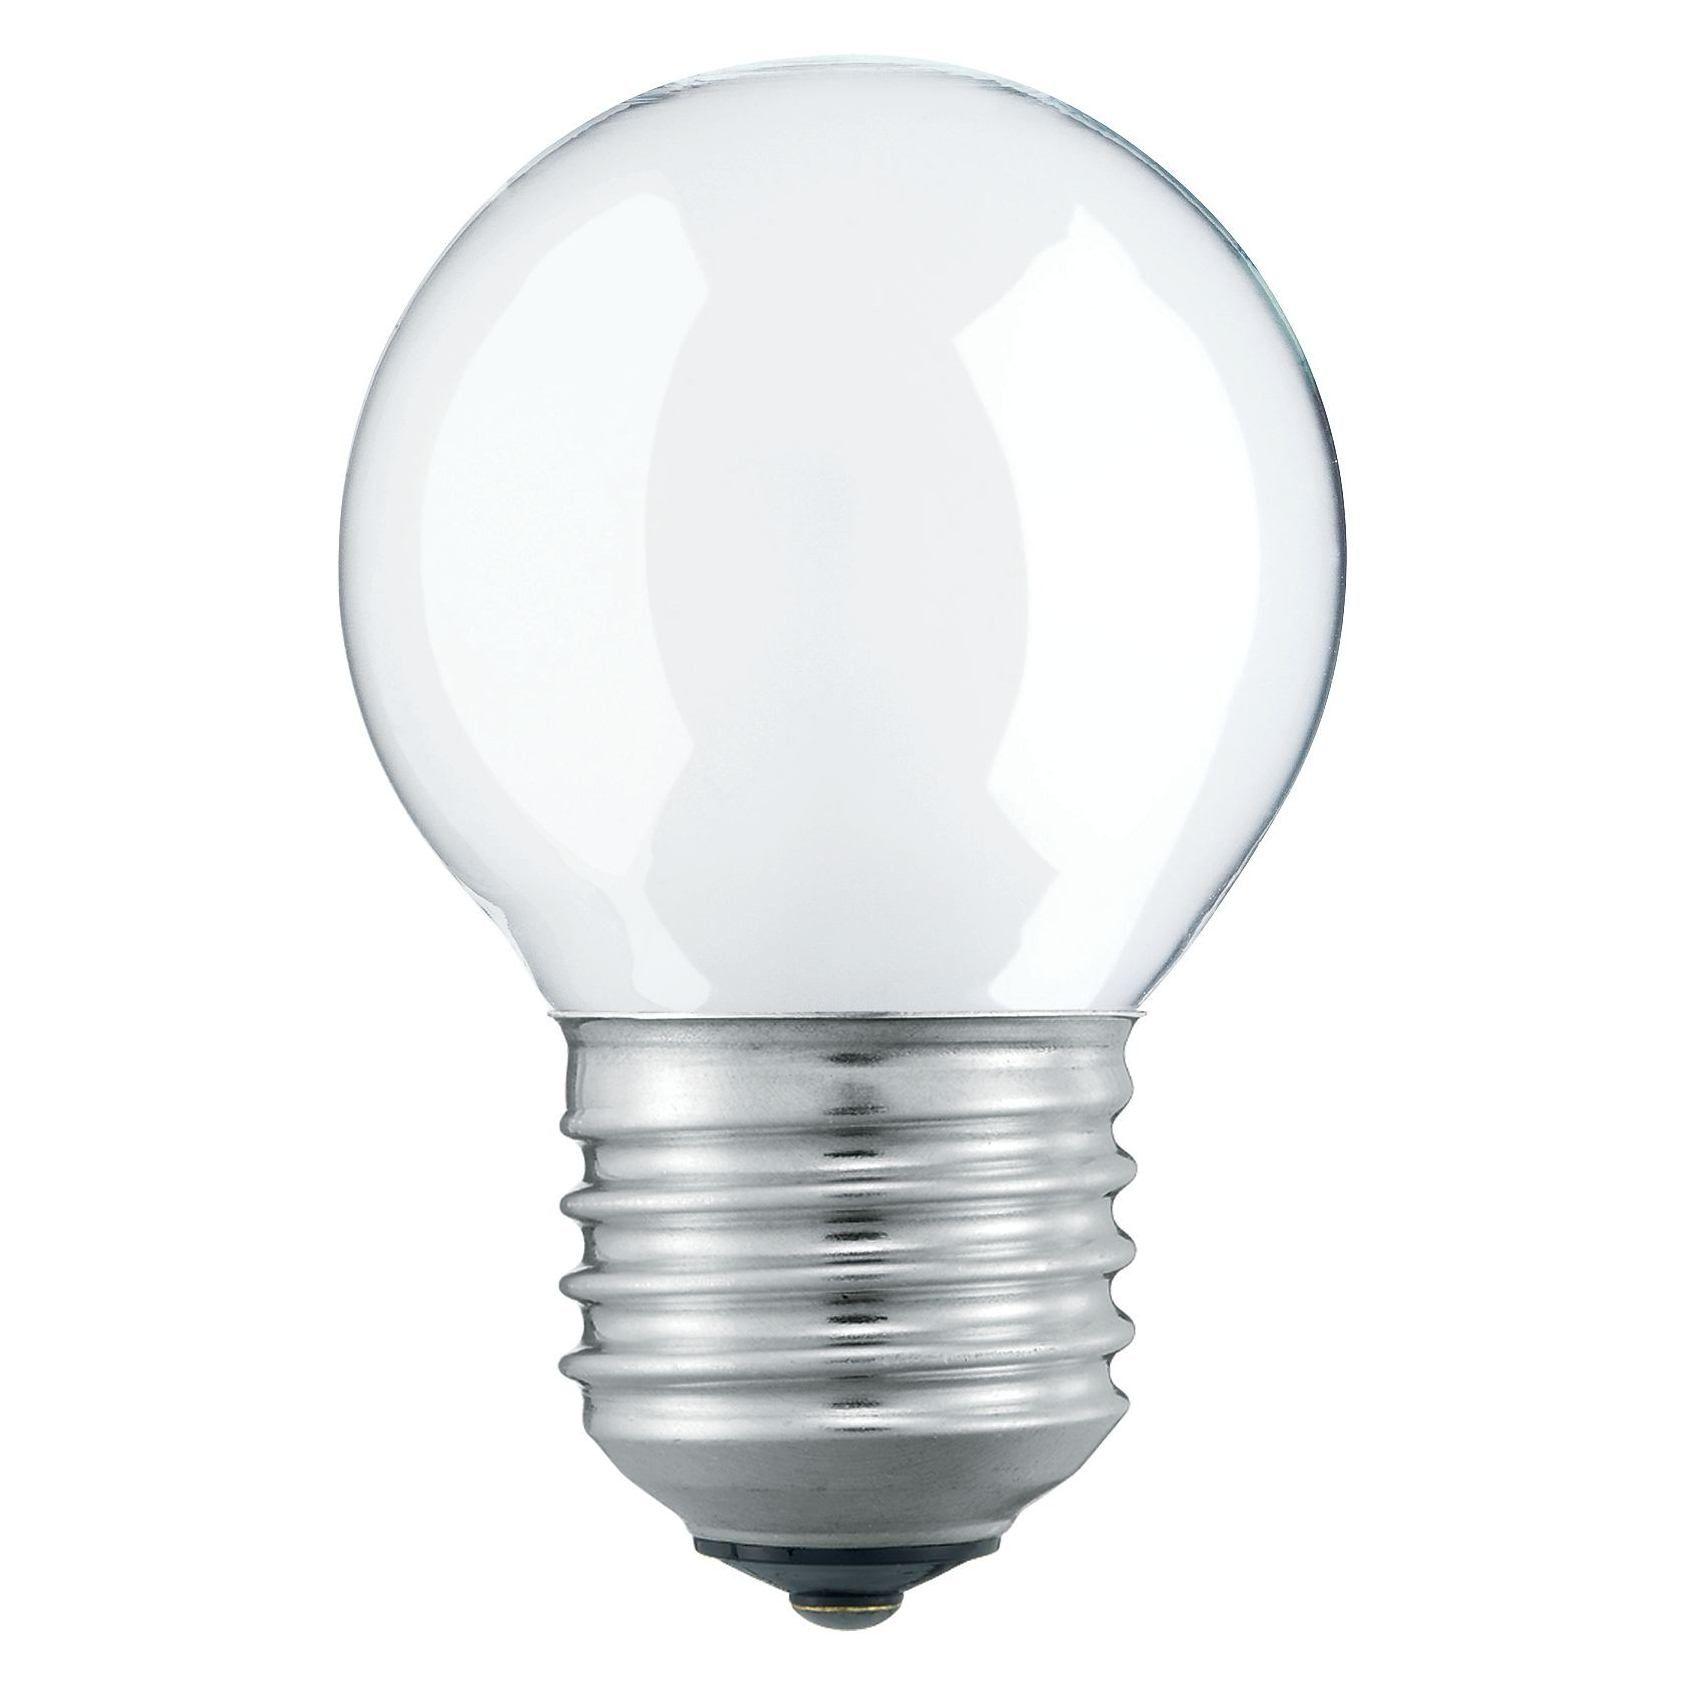 Купить Лампа накаливания Philips Stan 40W E27 230V P45 FR 1CT/10X10F матовая